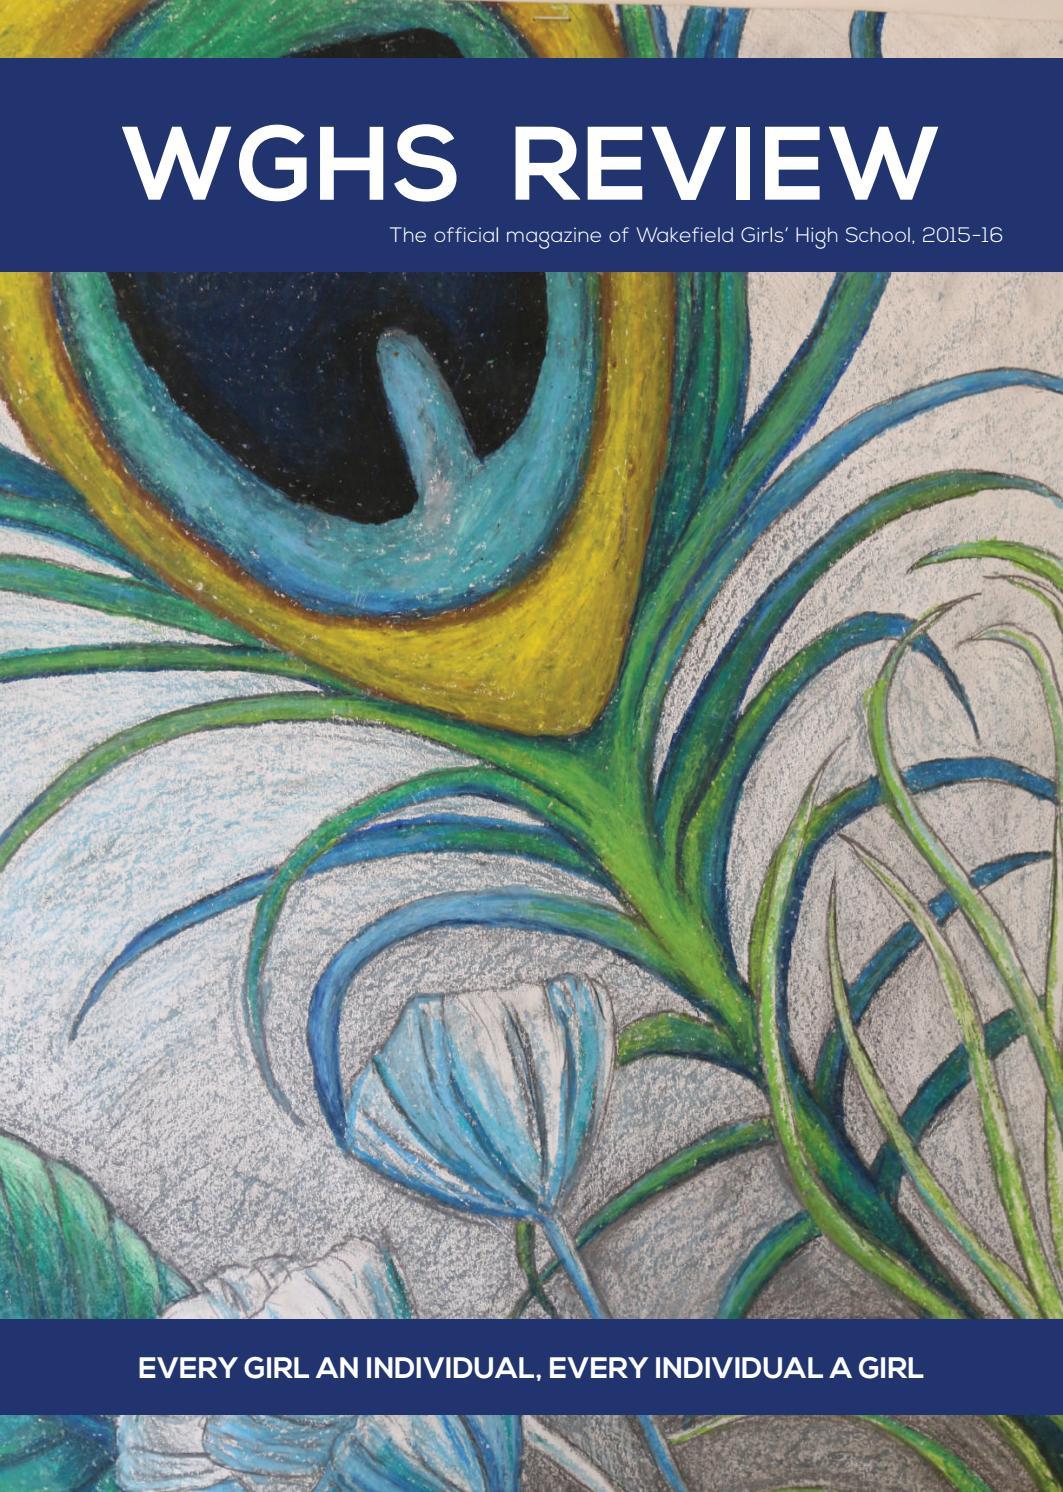 d56d8d123b78 WGHS Review Magazine 2016 by Wakefield Grammar School Foundation - issuu